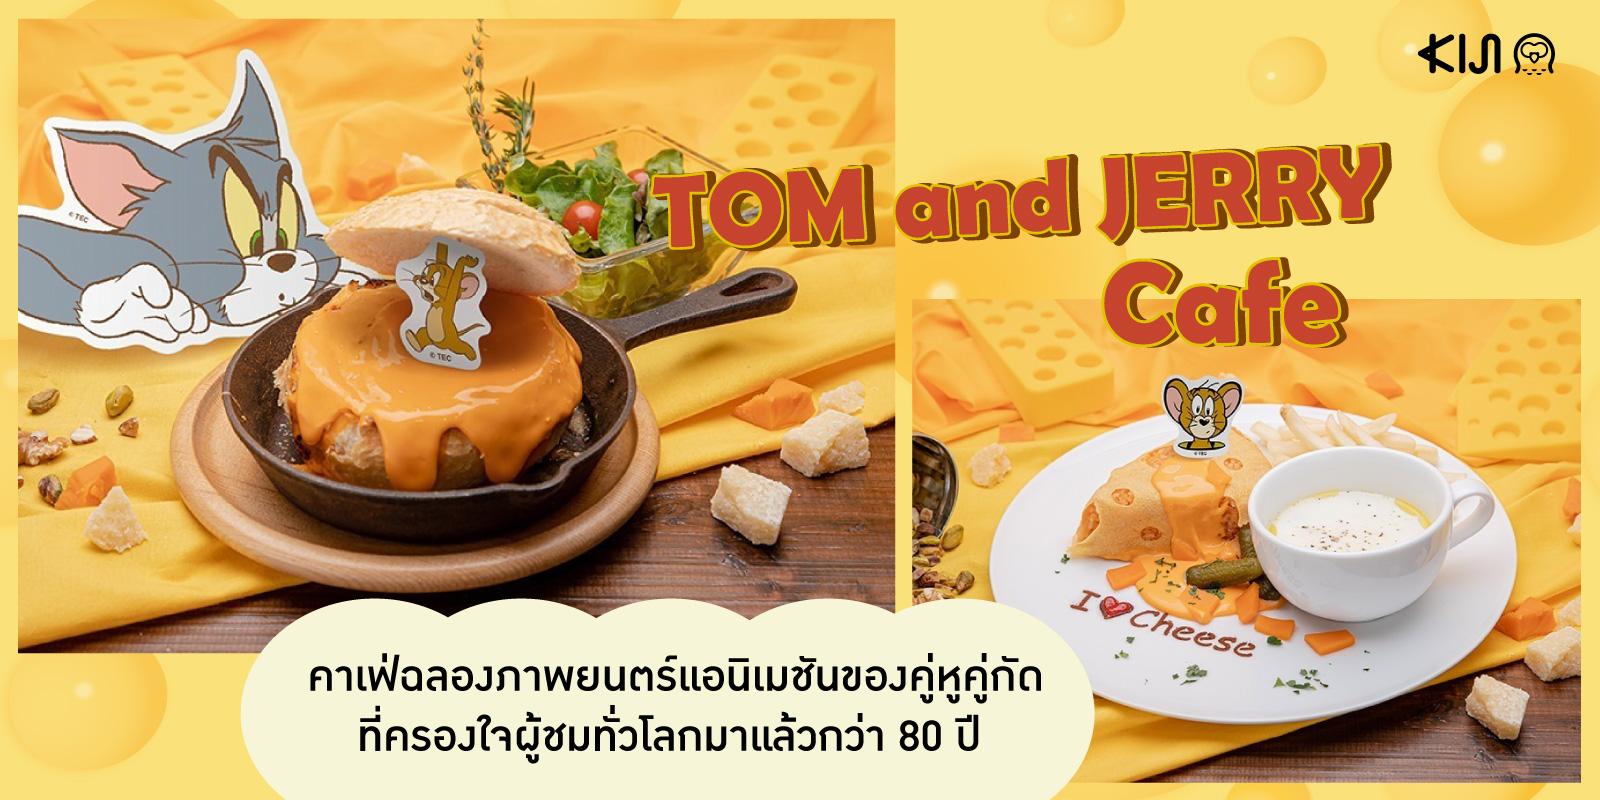 TOM and JERRY Cafe คาเฟ่ฉลองการเปิดตัวภาพยนตร์แอนิเมชันทอมแอนด์เจอร์รี่ในญี่ปุ่น